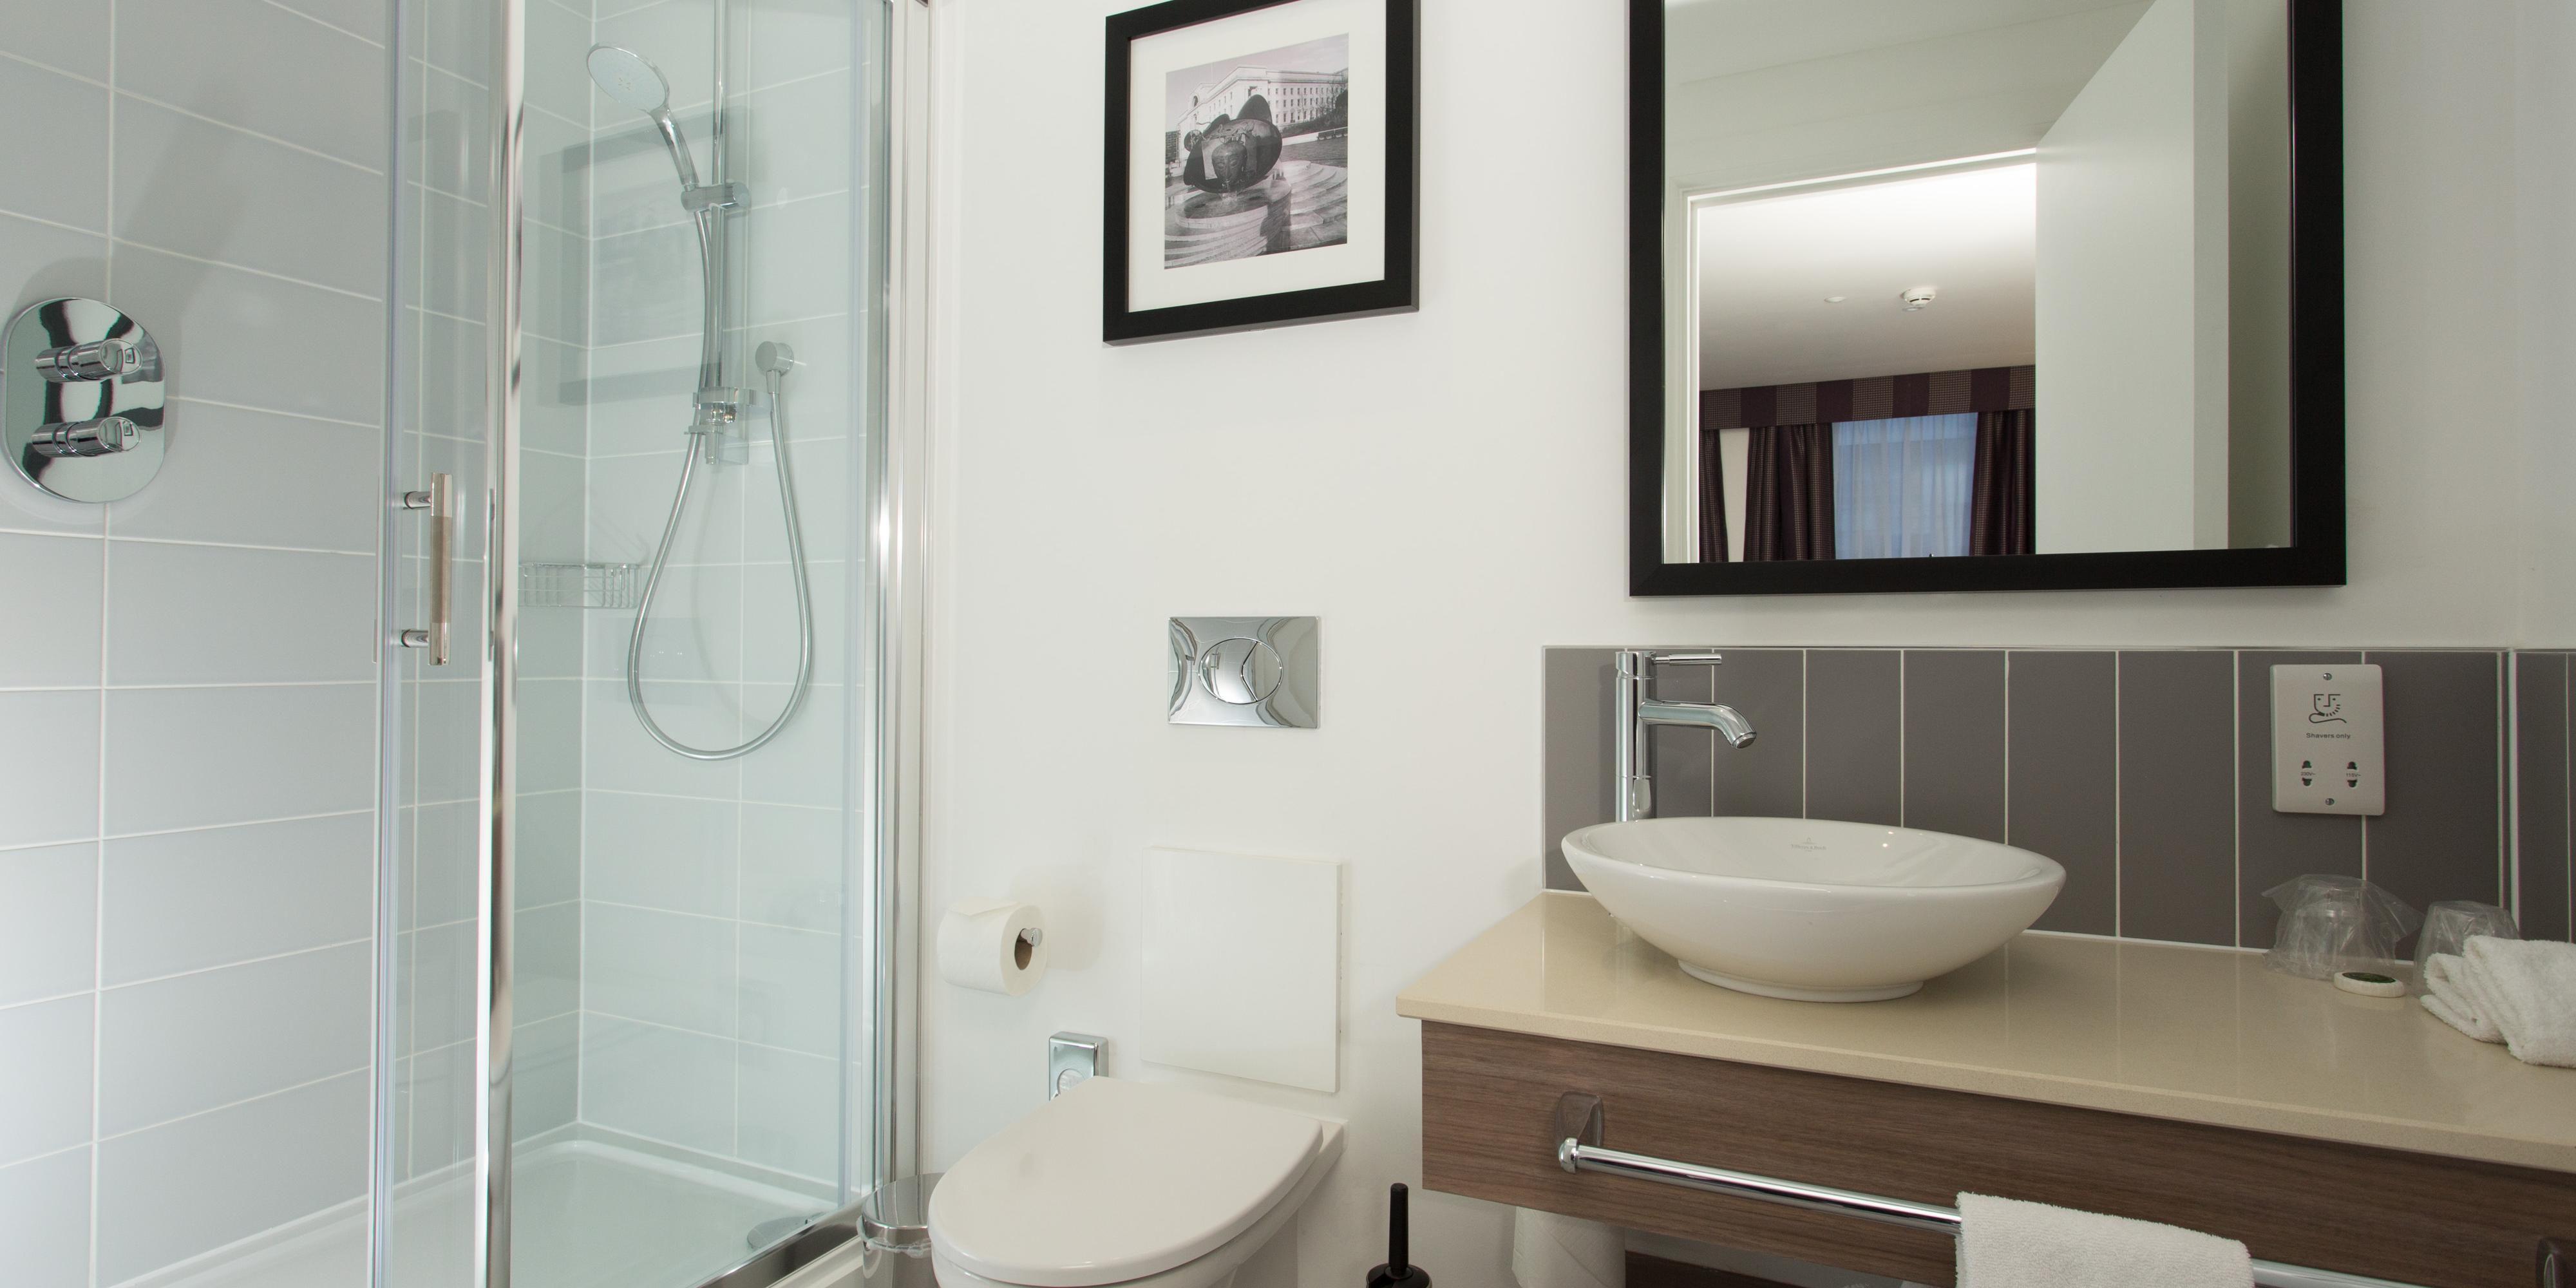 Extended-Stay Hotel: Staybridge Suites Birmingham, UK